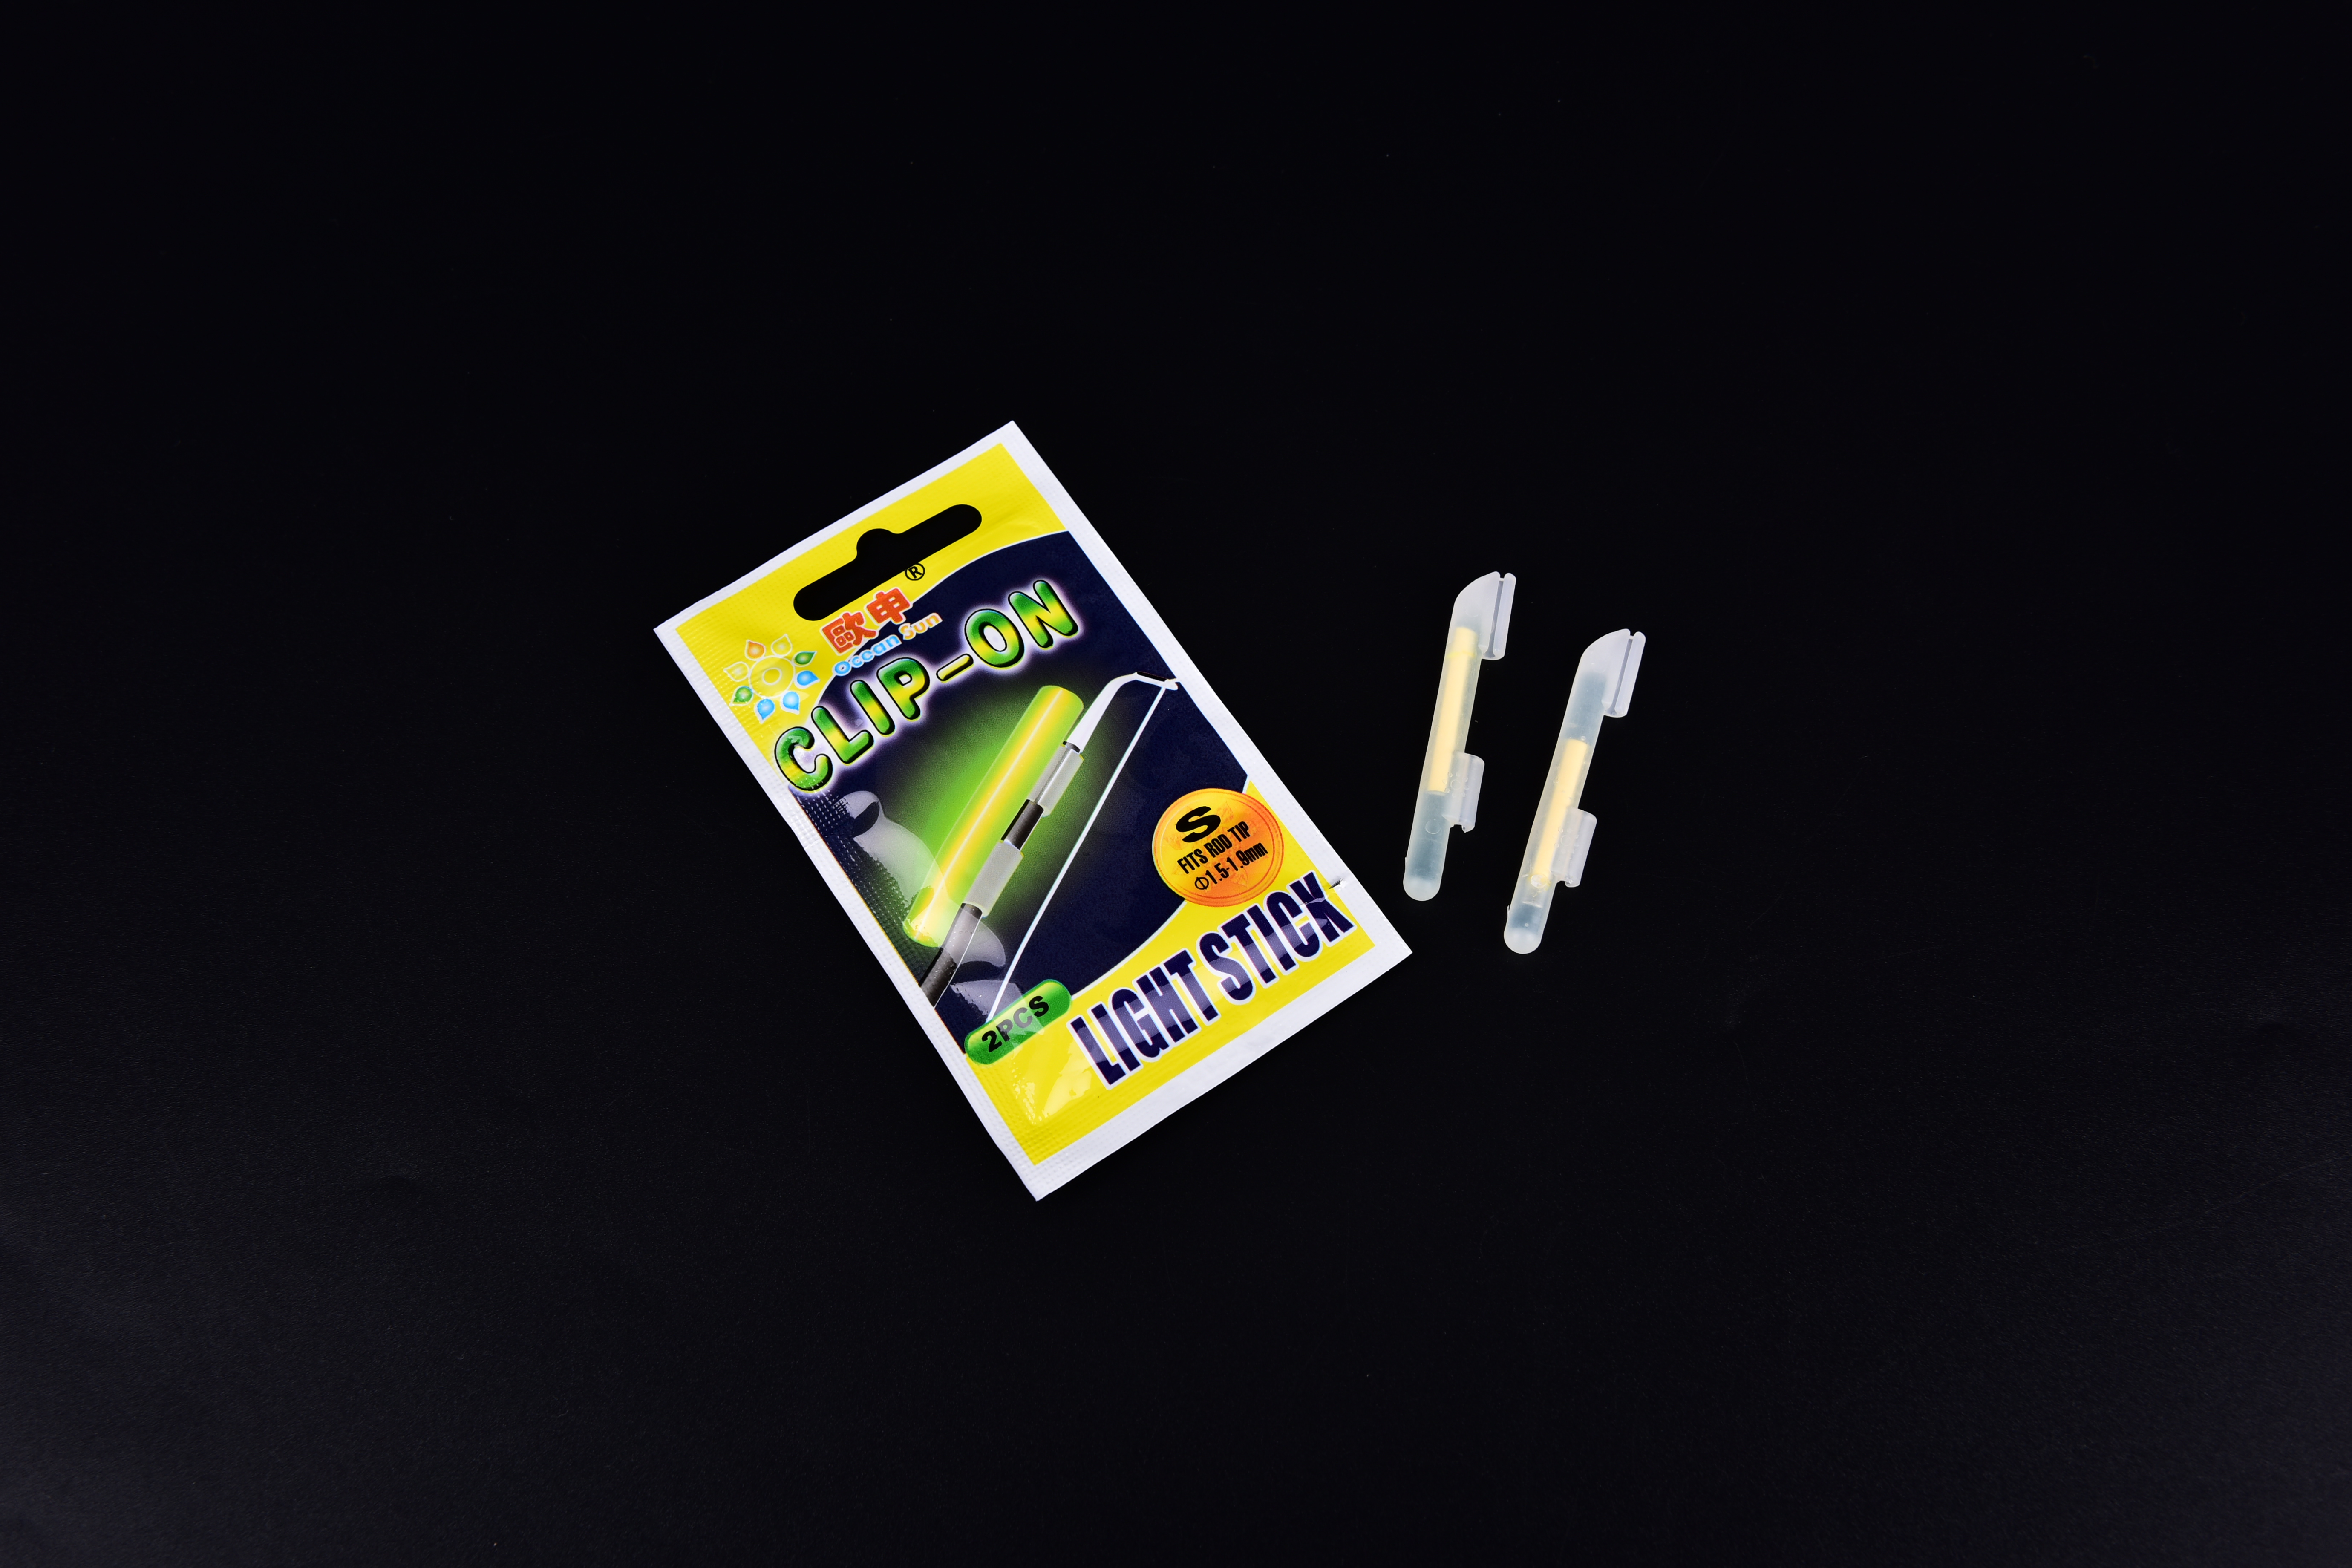 20Pcs SSSML Fishing Light Night Float Rod Dark Glow Fluorescent Stick Luminous Squid Fish Lure Set 4.5*0.5 cm